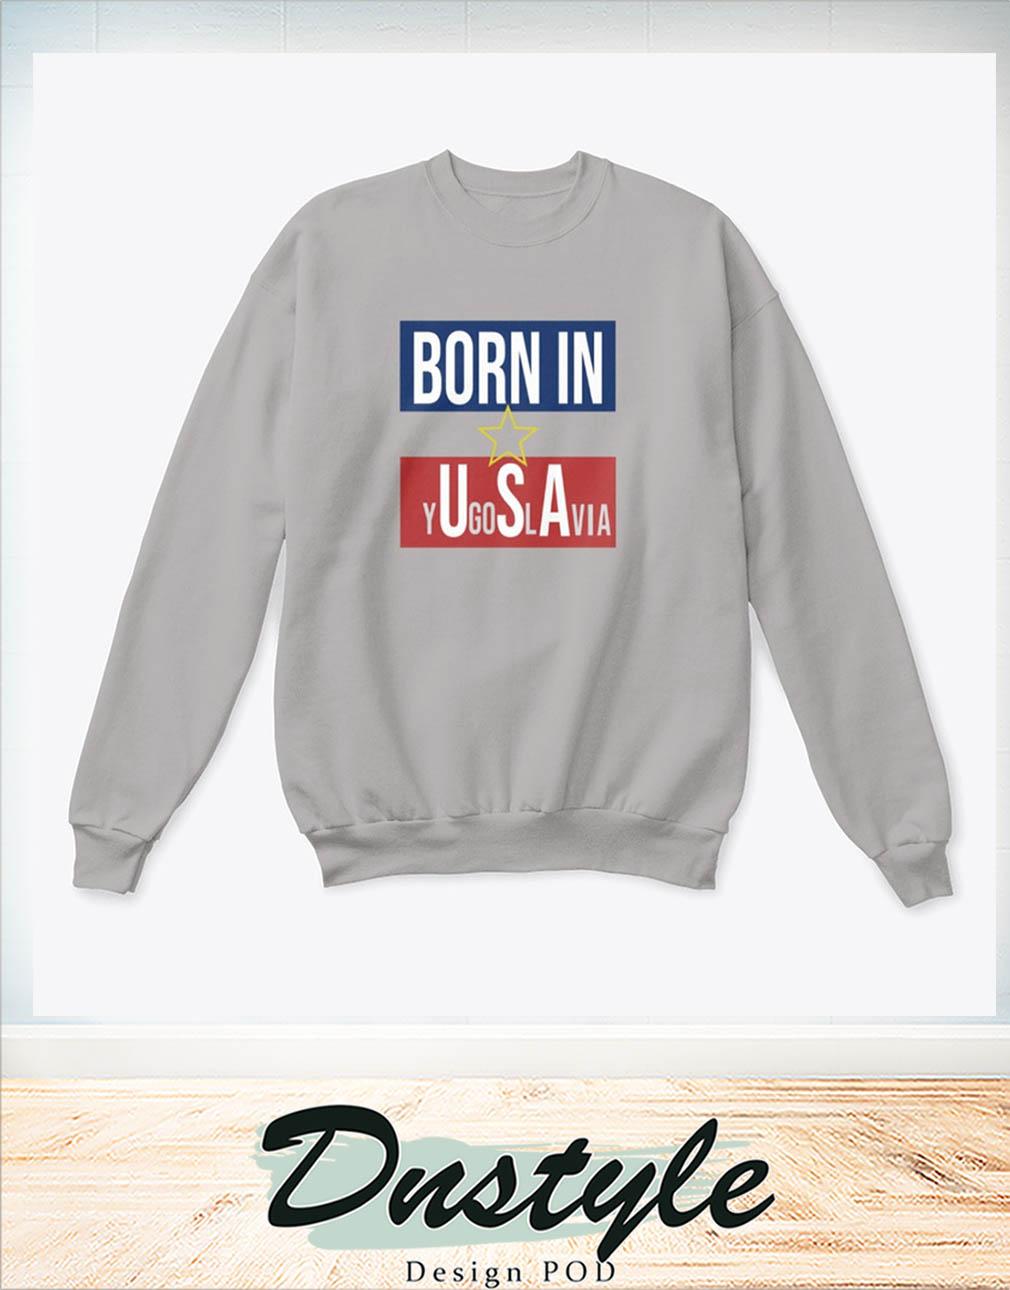 Born in YU-GI-OH-SLAVIA sweatshirt